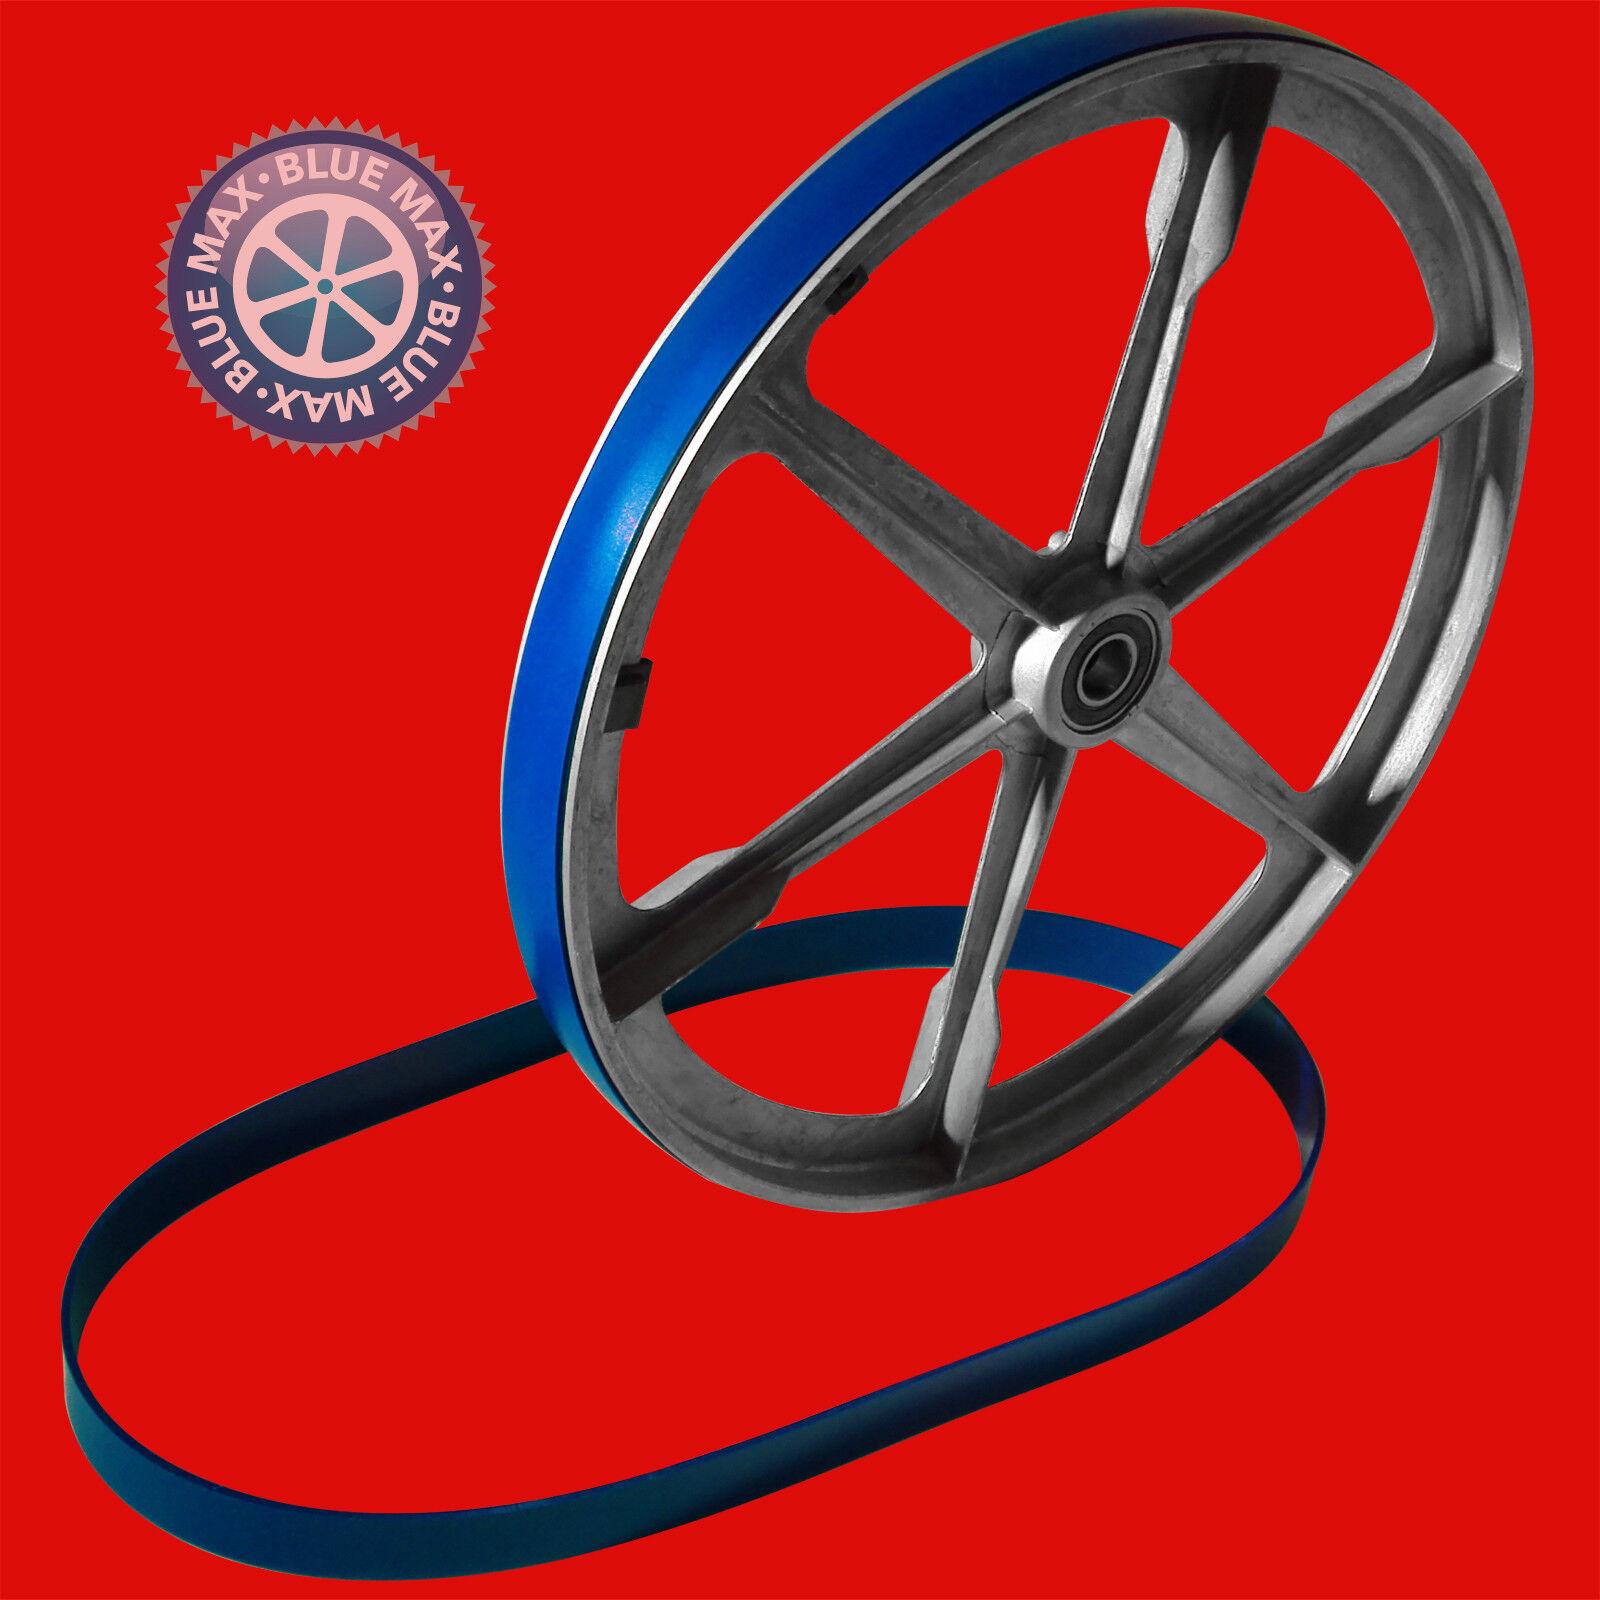 2 Blaues Max Ultra Muy Cinta Sierra Juego de Ruedas para Lini Tb-450